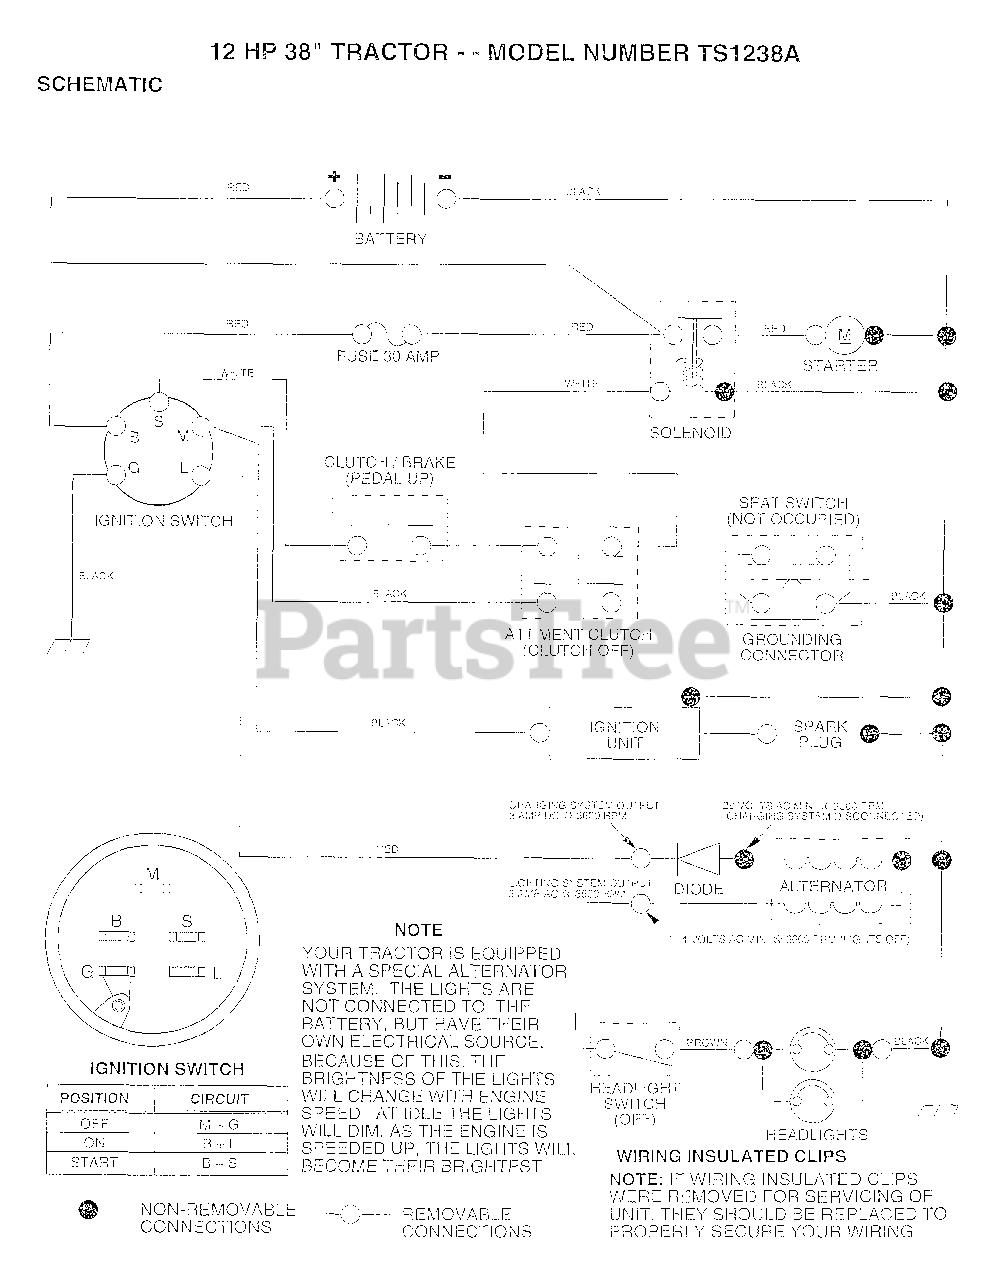 [DIAGRAM_3NM]  Electrolux/AYP TS 1238 A - Electrolux/AYP Lawn Tractor (1993) 12HP 38